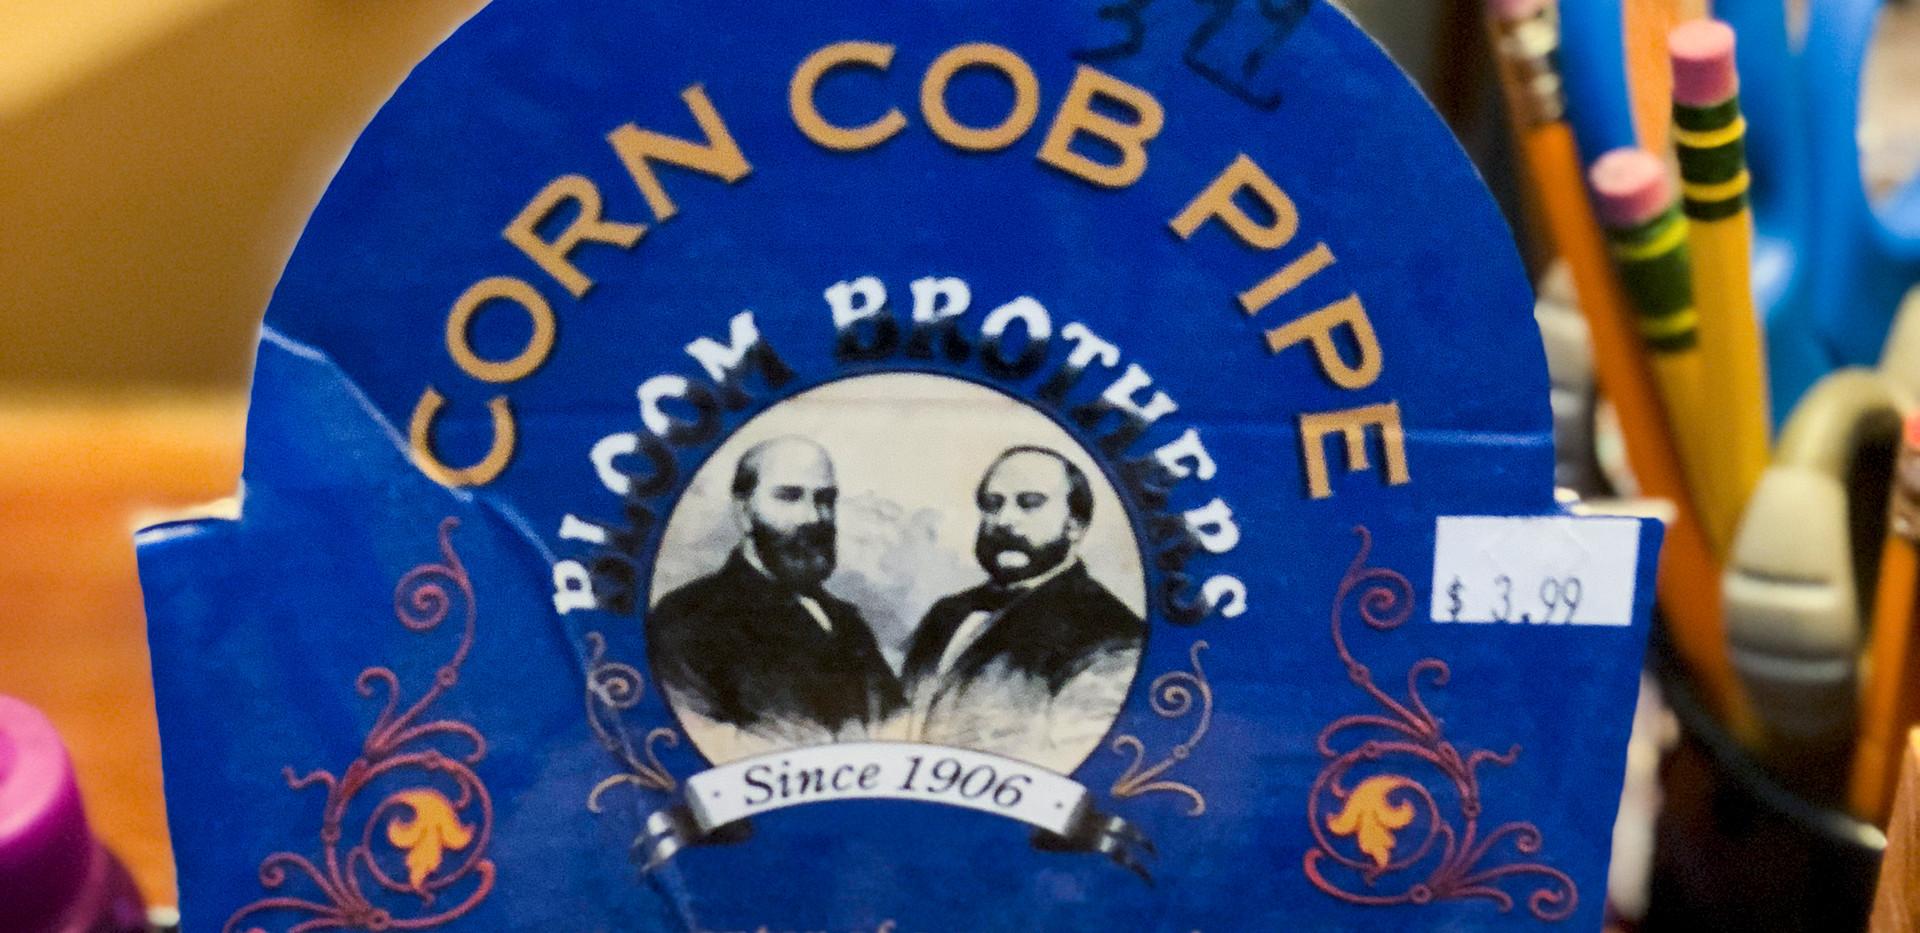 CornCobPipes.jpg